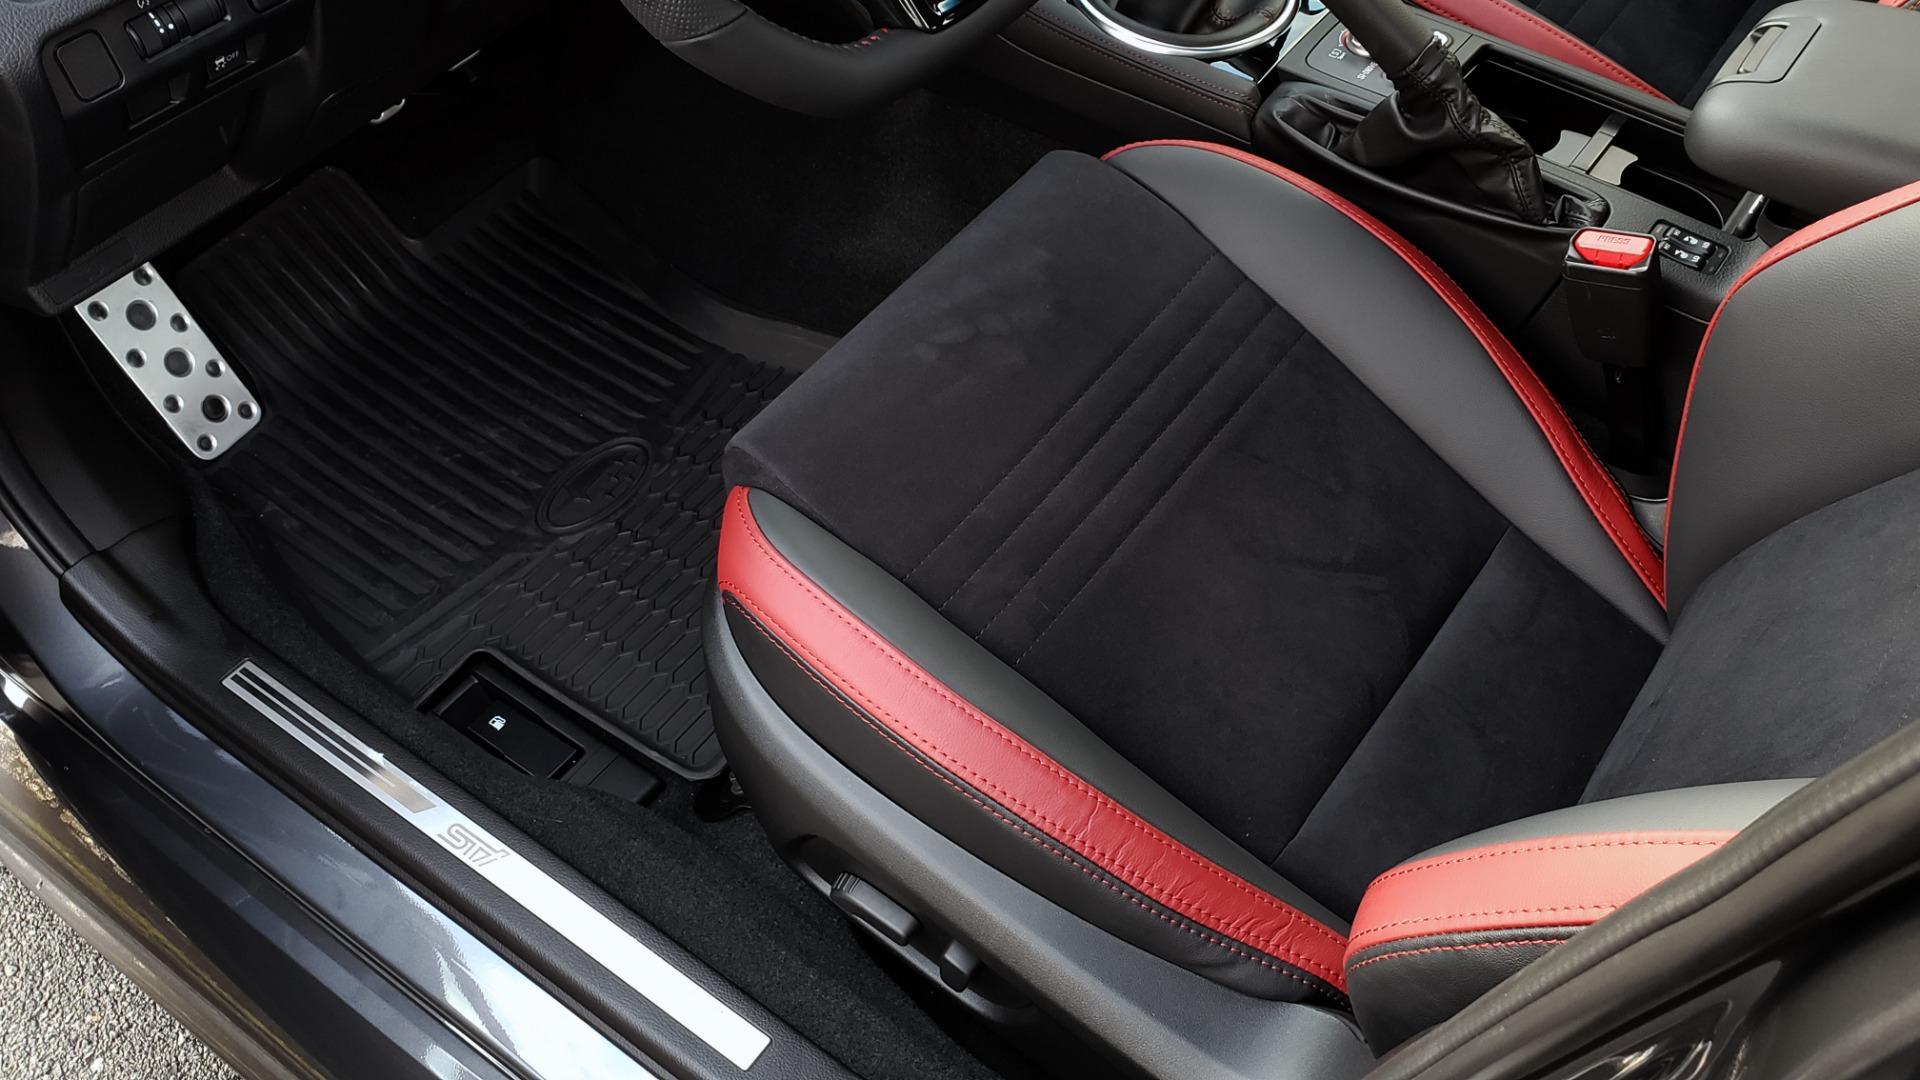 Used 2020 Subaru WRX STI 2.5L TURBO / 6-SPEED MANUAL / RECARO SEATS / REARVIEW for sale Sold at Formula Imports in Charlotte NC 28227 26